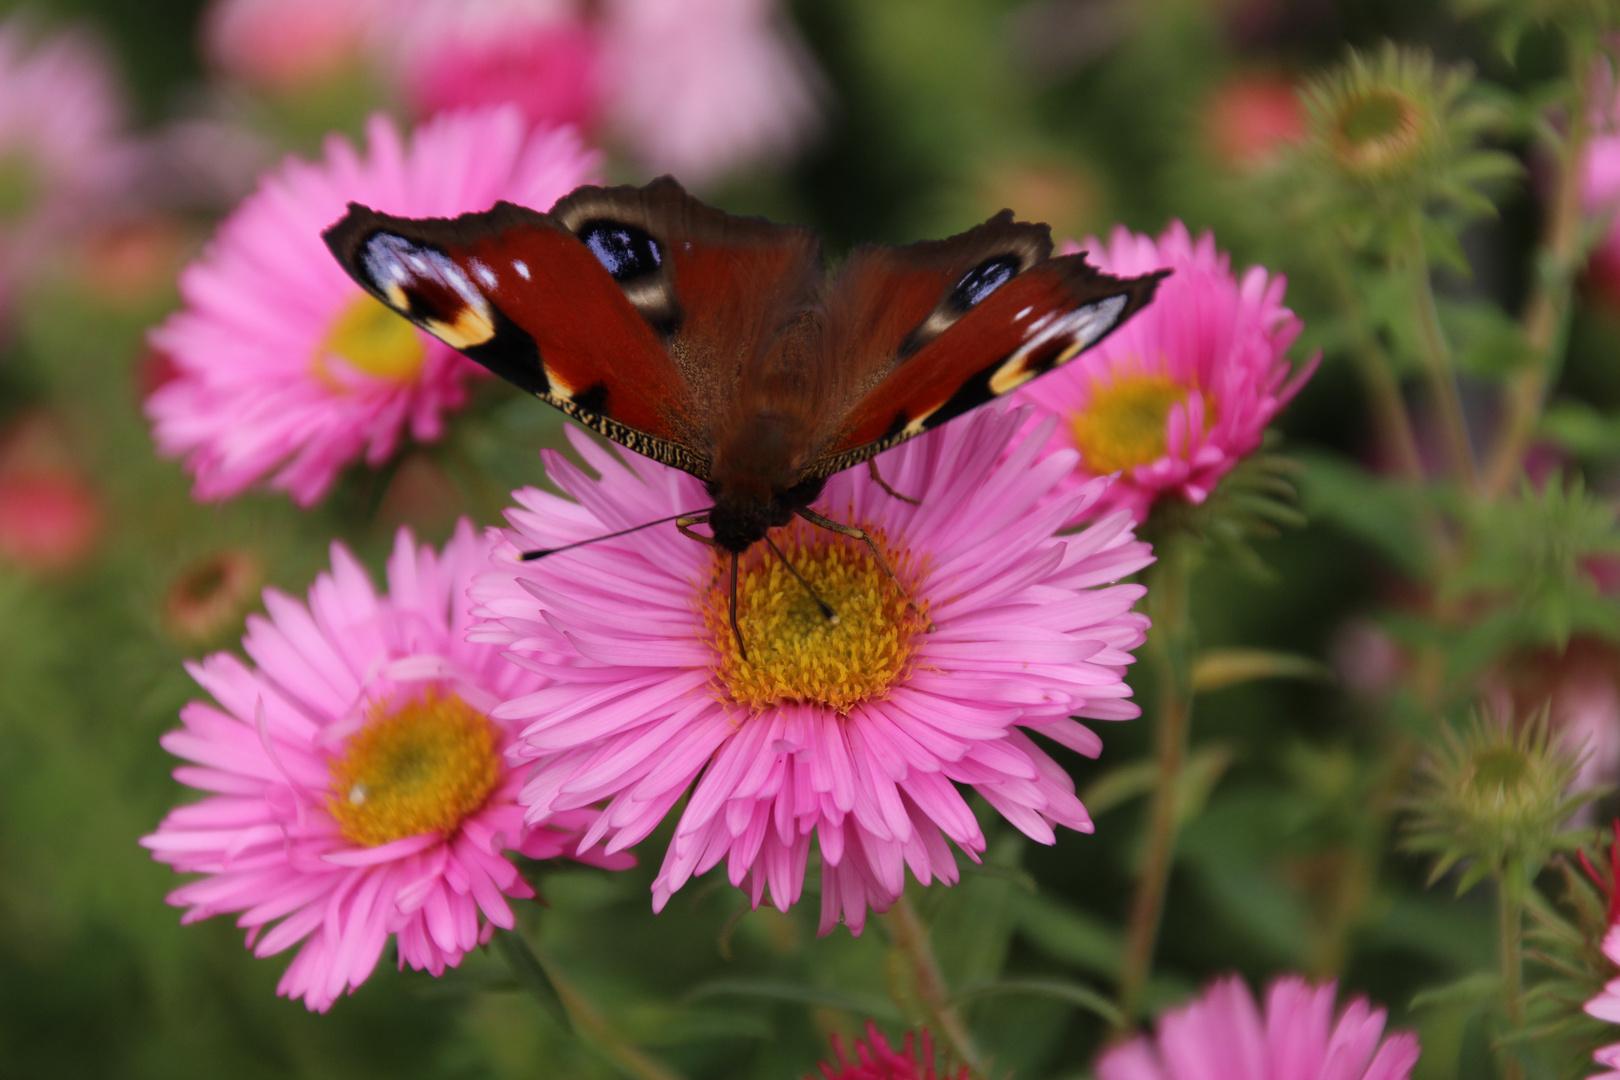 Herbst, Schmetterling, Blumen